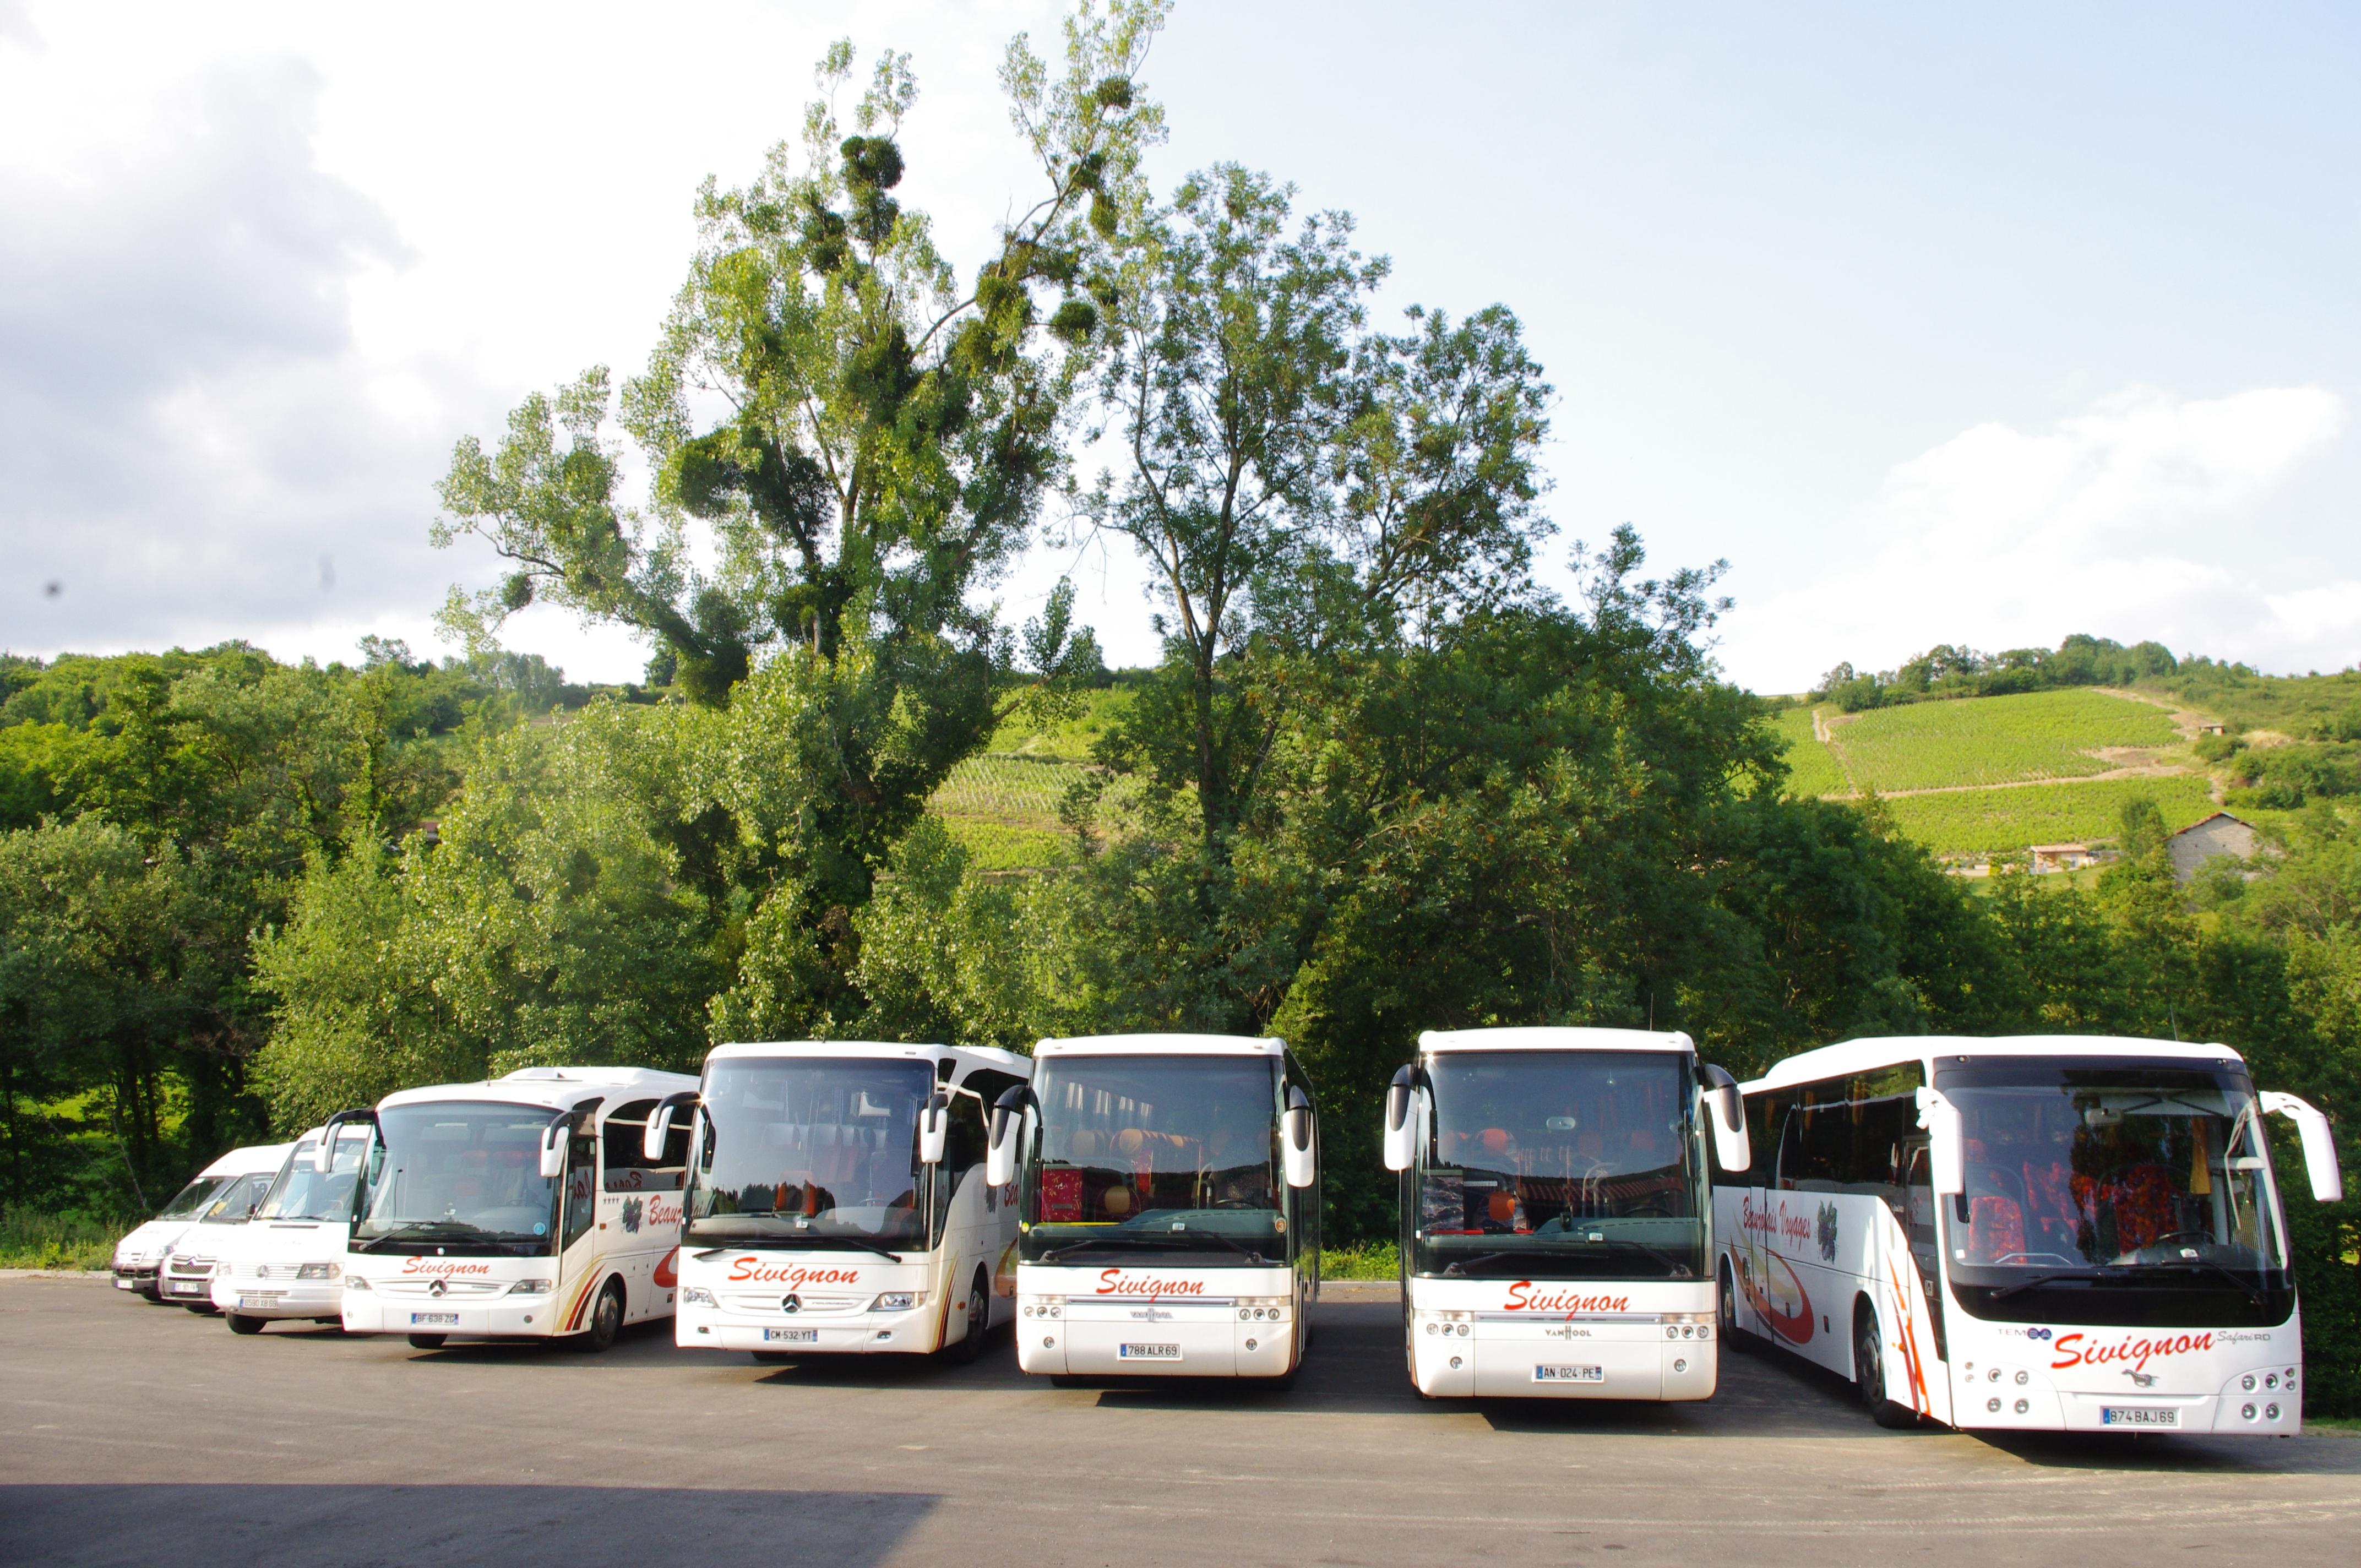 Cars Sivignon Beaujolais Voyages Rhône Alpes